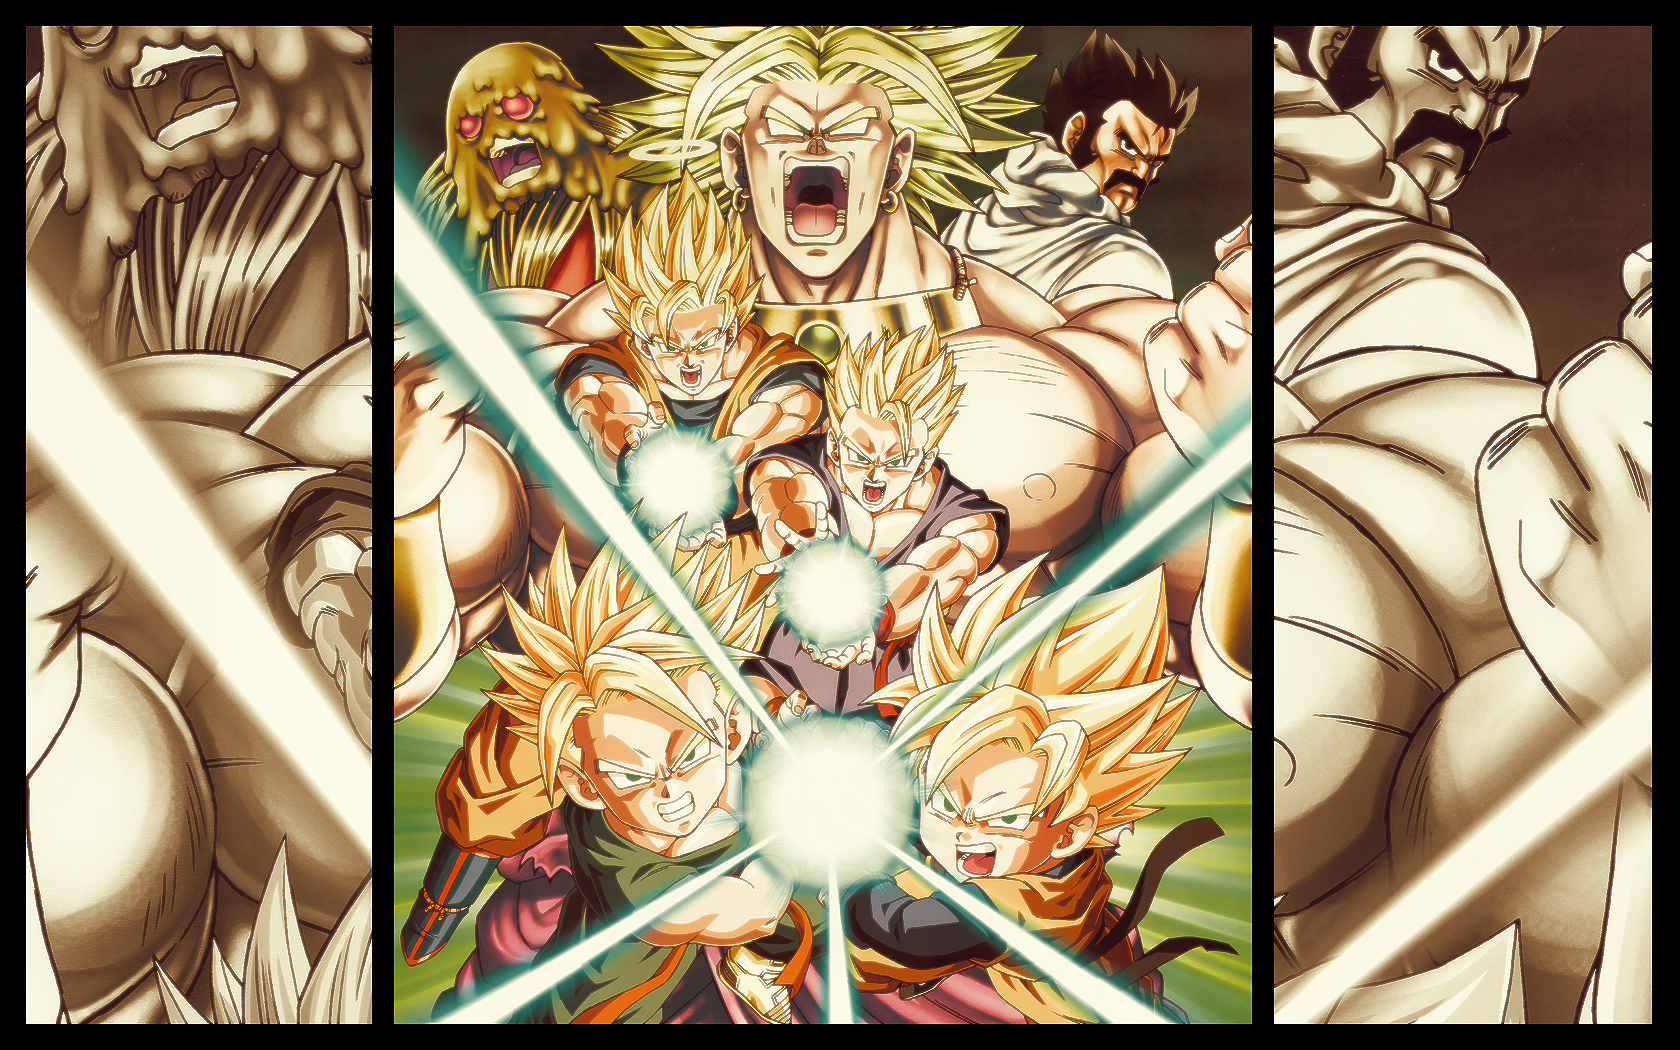 DBZ Warriors   Widescreen Dragon ball Z Wallpapers of Goku Vegeta   o 1680x1050